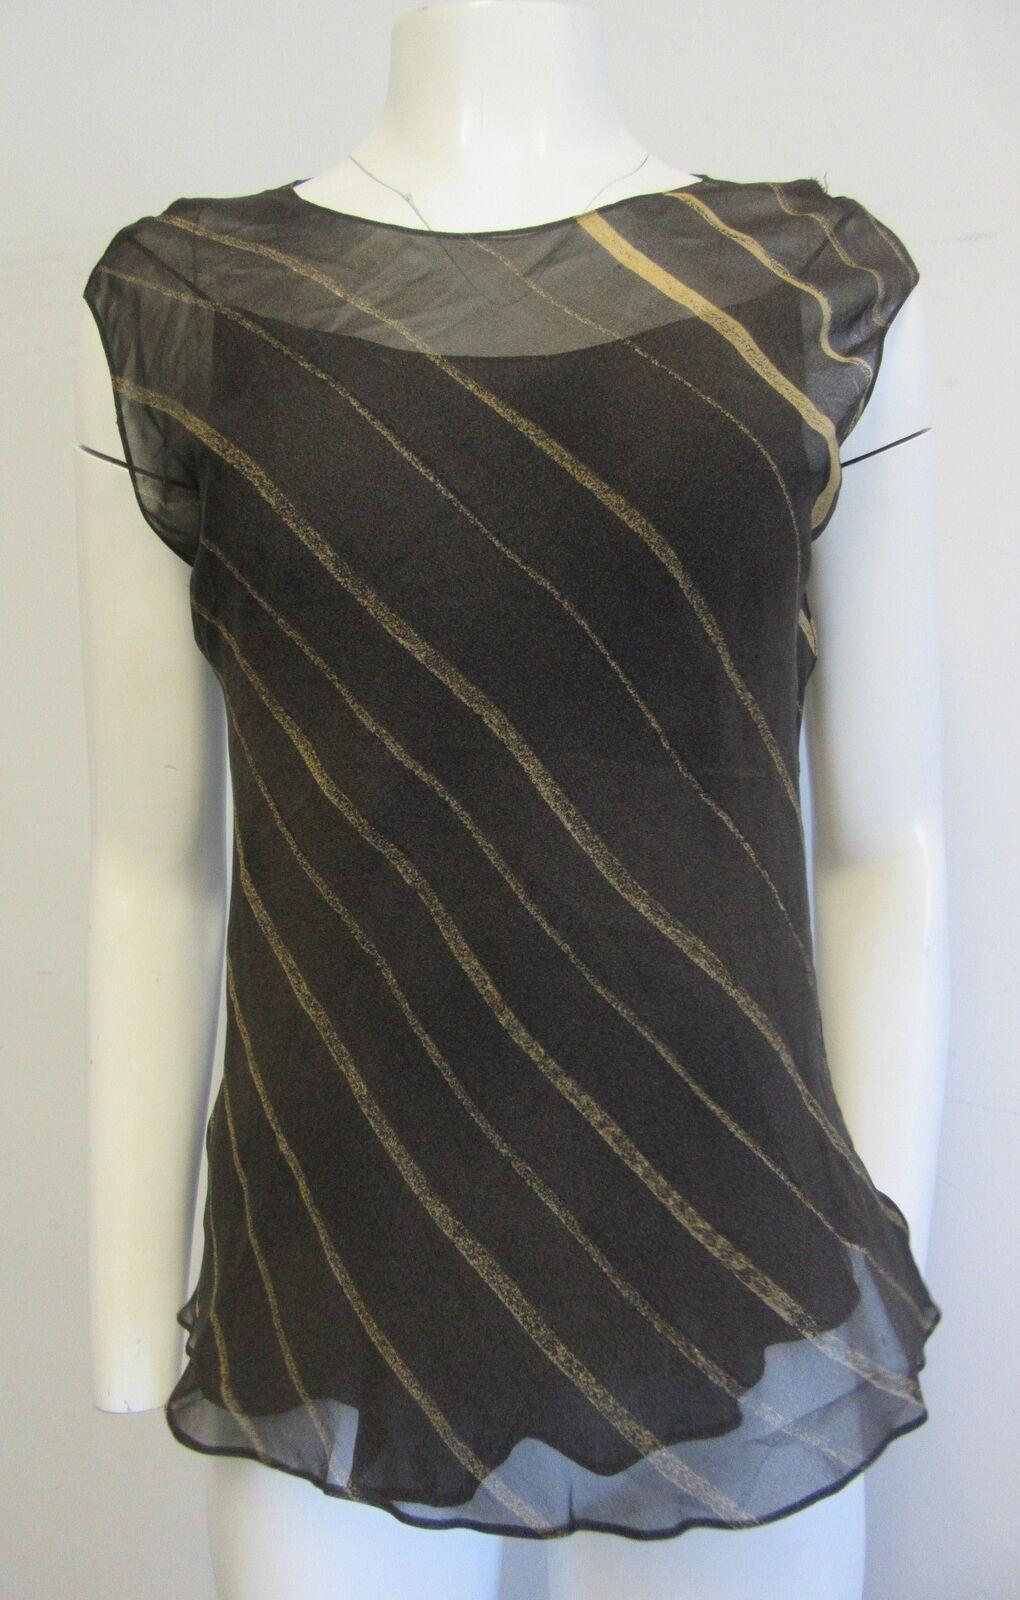 damen KARAN 100% silk sheer braun & tan stripe sleeveless top sz I 44  US 10